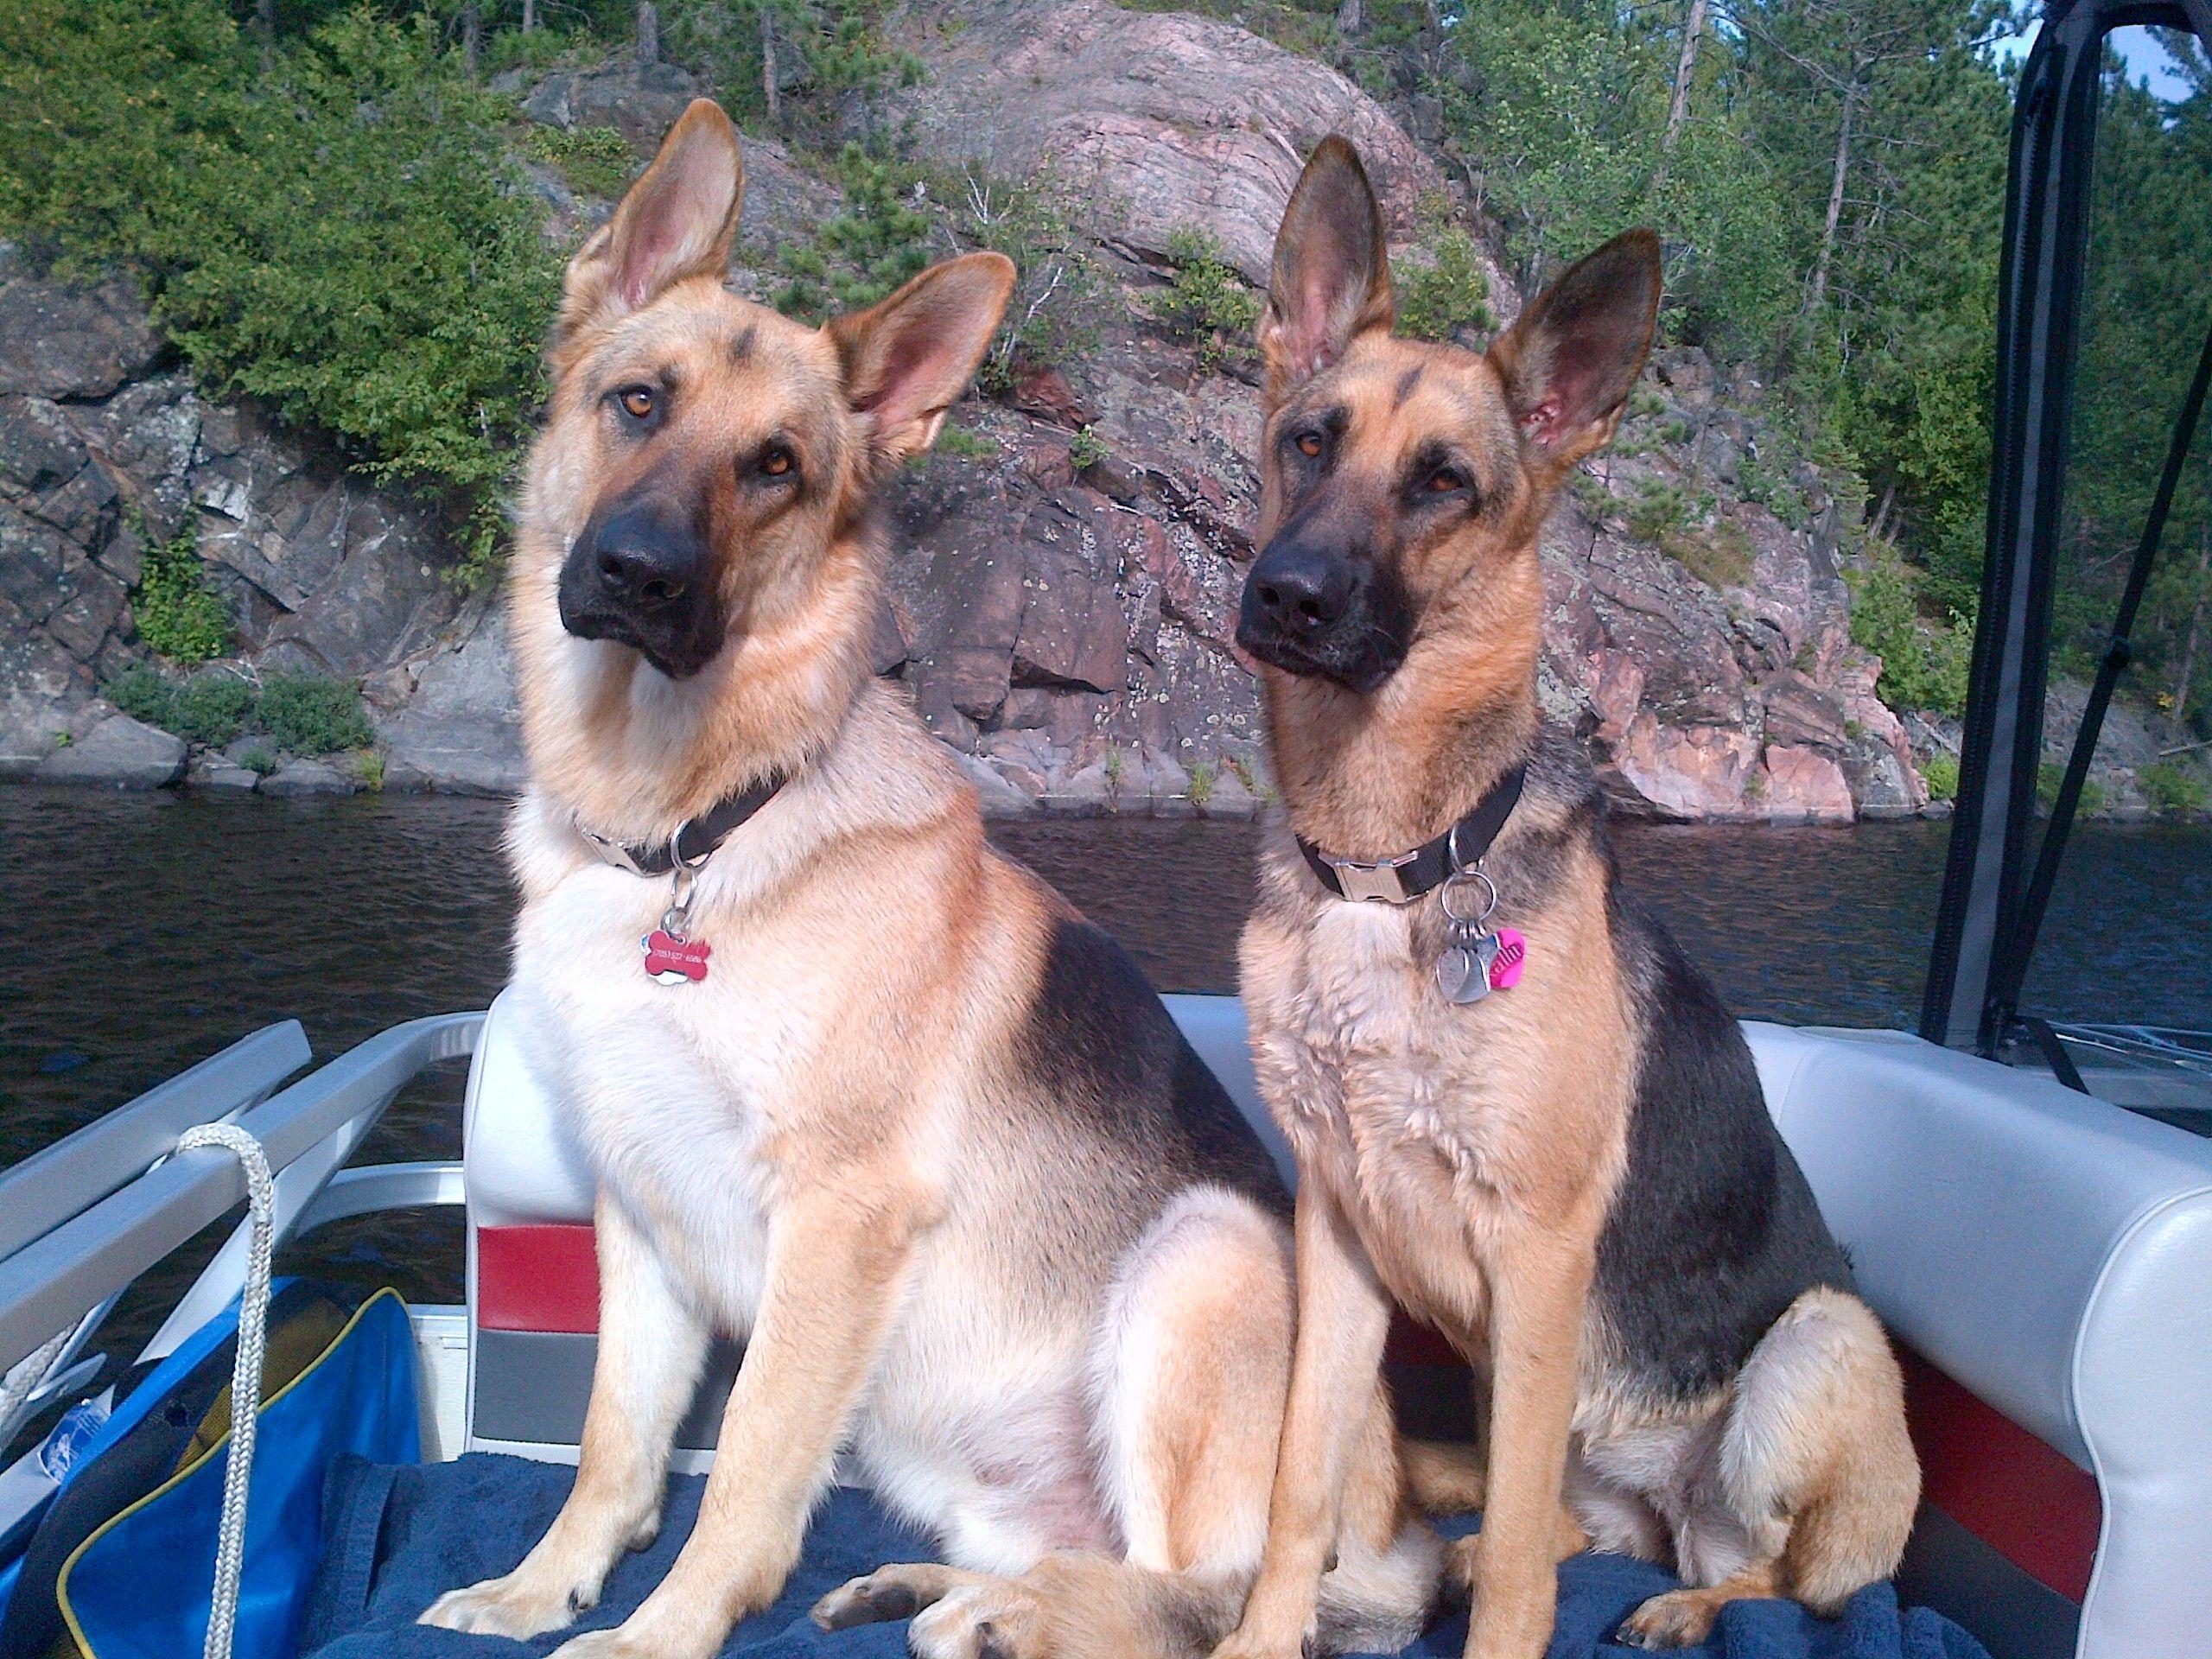 Gsds Kallii Jaxon Pontoon Pups With Images German Shepherd German Shepherd Dogs Pup